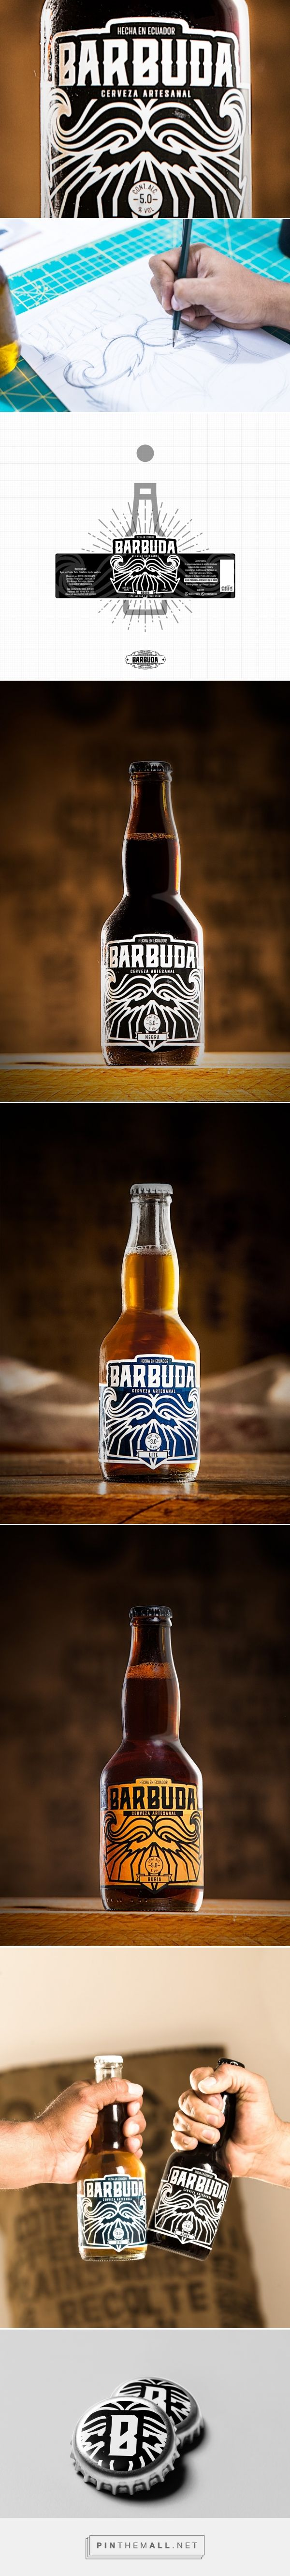 Barbuda Craft Beer packaging design by Urbanofacto Lab - https://www.packagingoftheworld.com/2018/04/barbuda-craft-beer.html